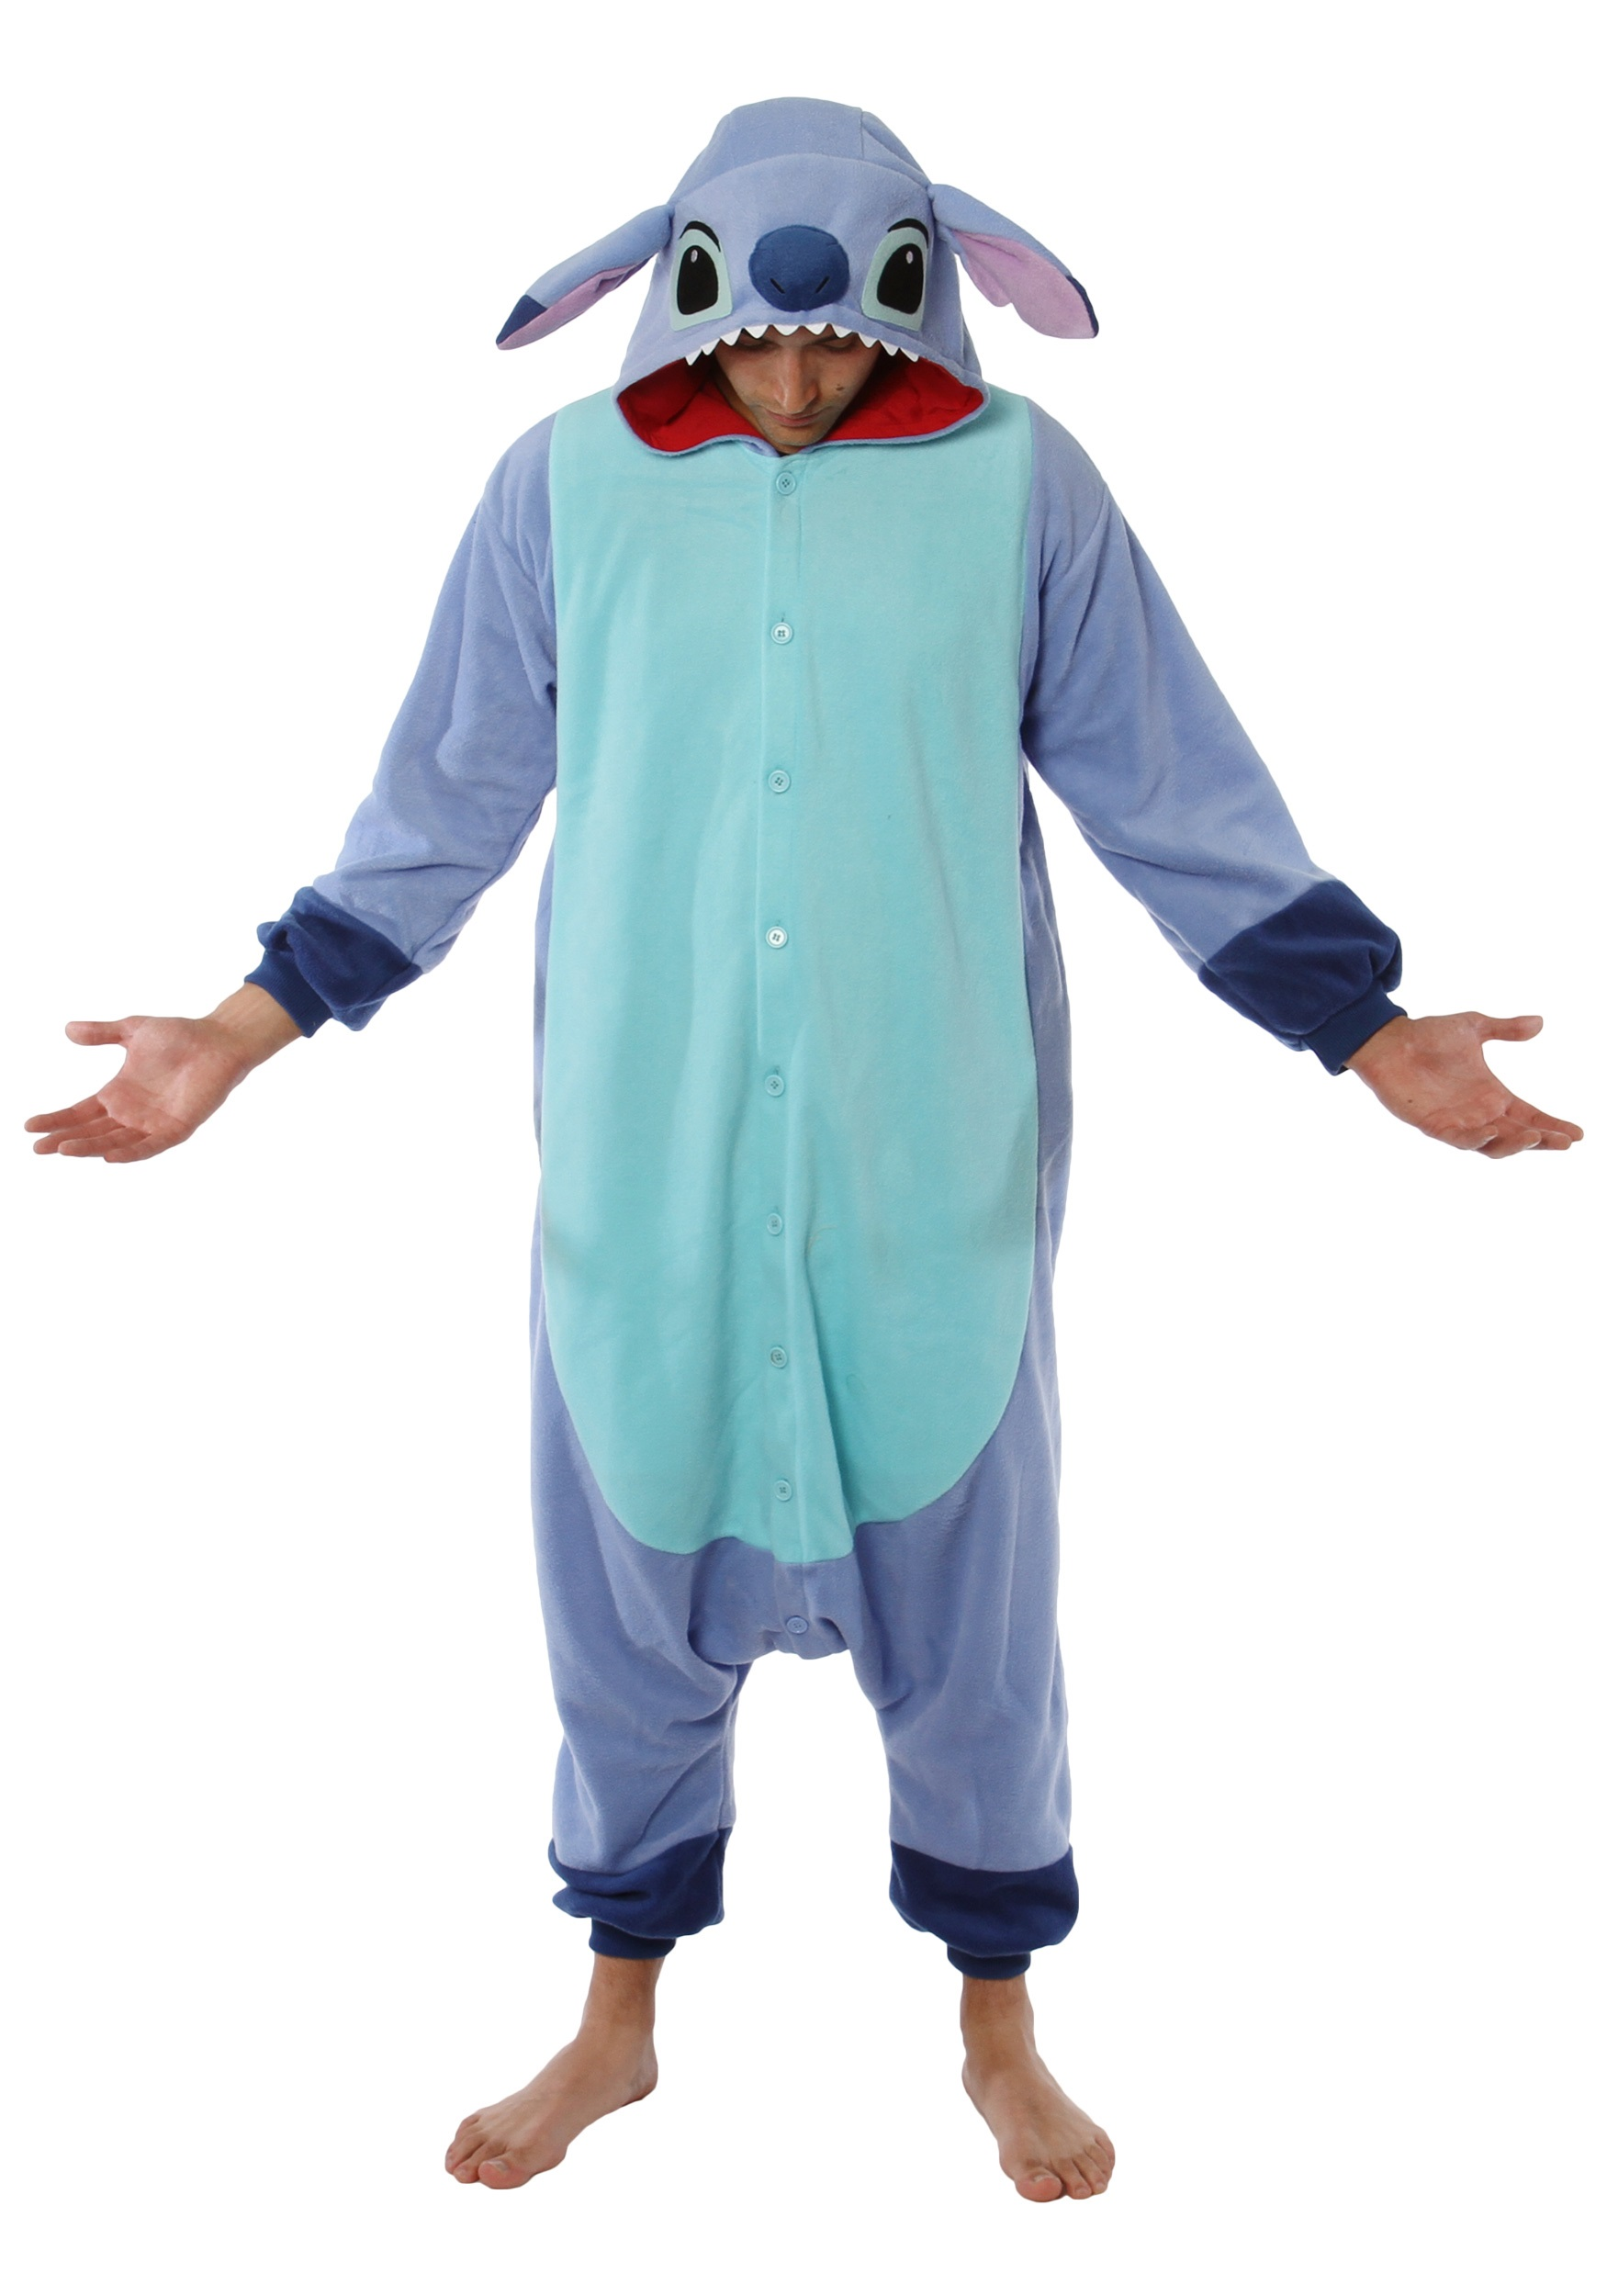 Stitch Kigurumi Pajamas For Adults Lilo And Stitch Costume